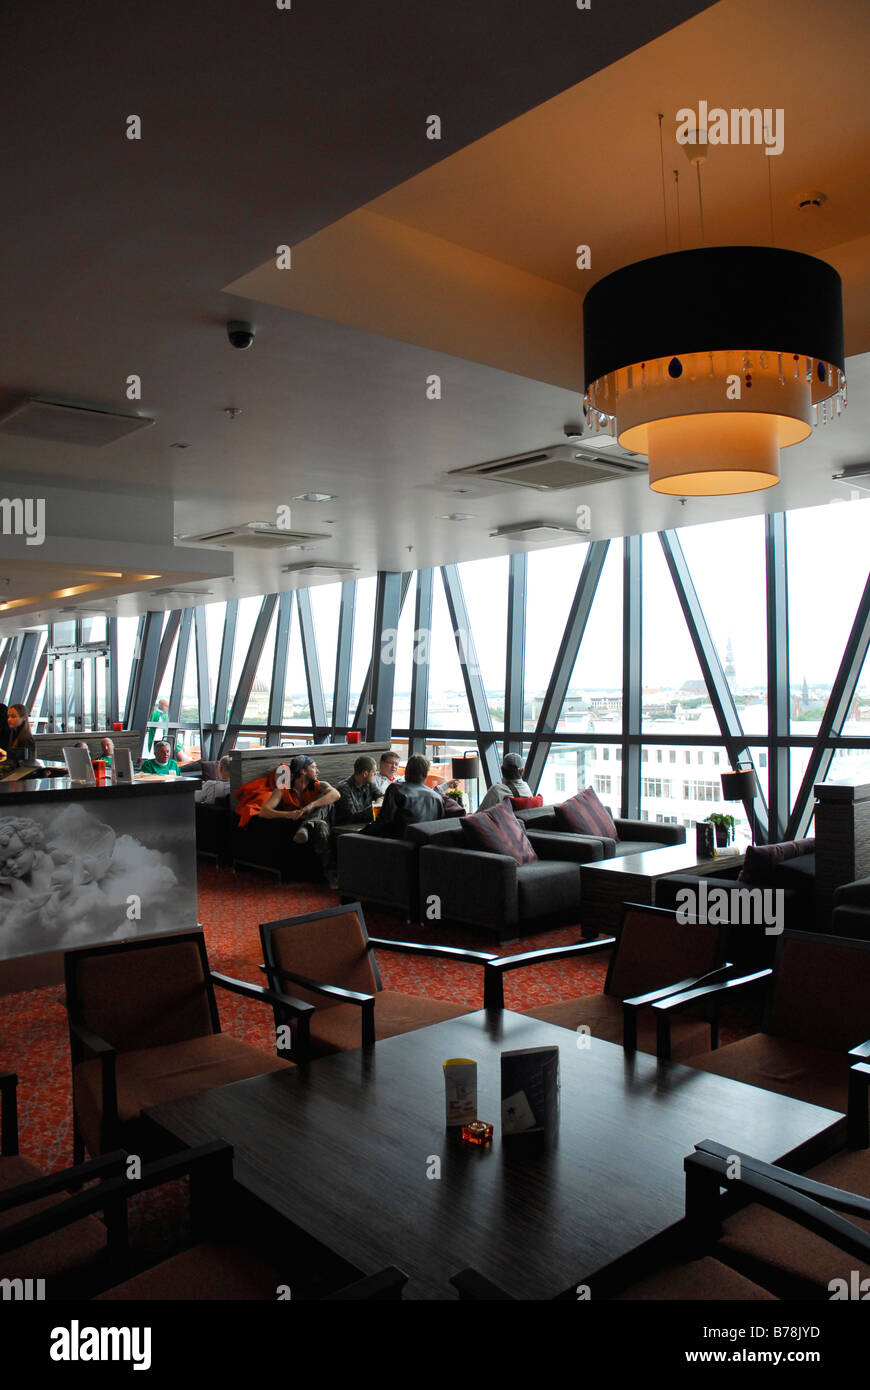 Albert Hotel restaurant, a modern high rise hotel in the Dzirnavu ...